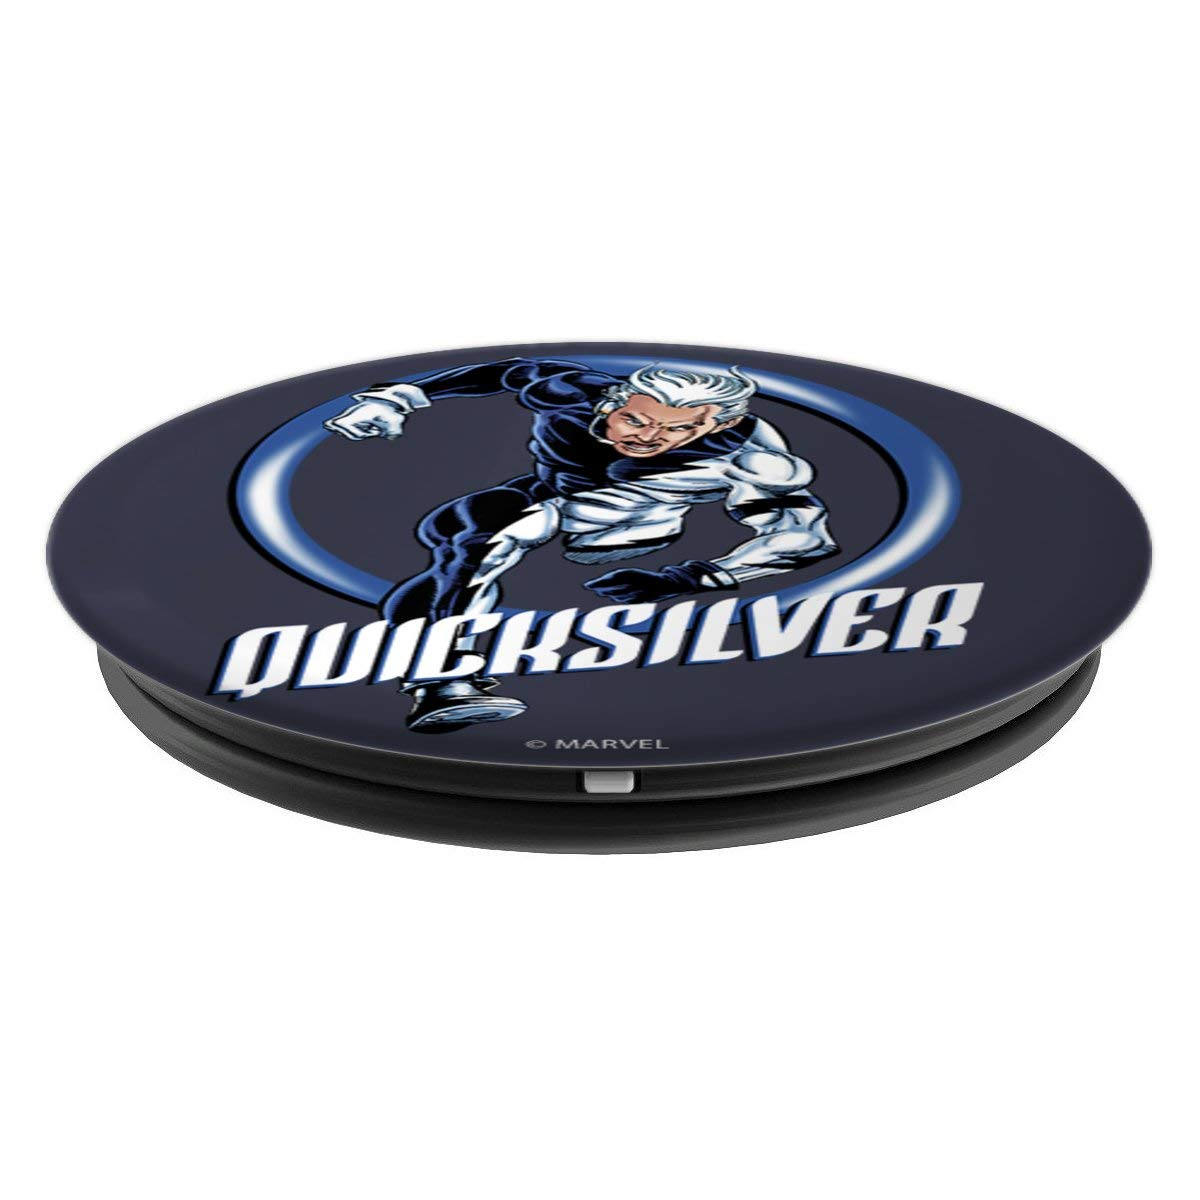 Amazon.com: Marvel X-Men Quicksilver The Dart Ring Dash ...